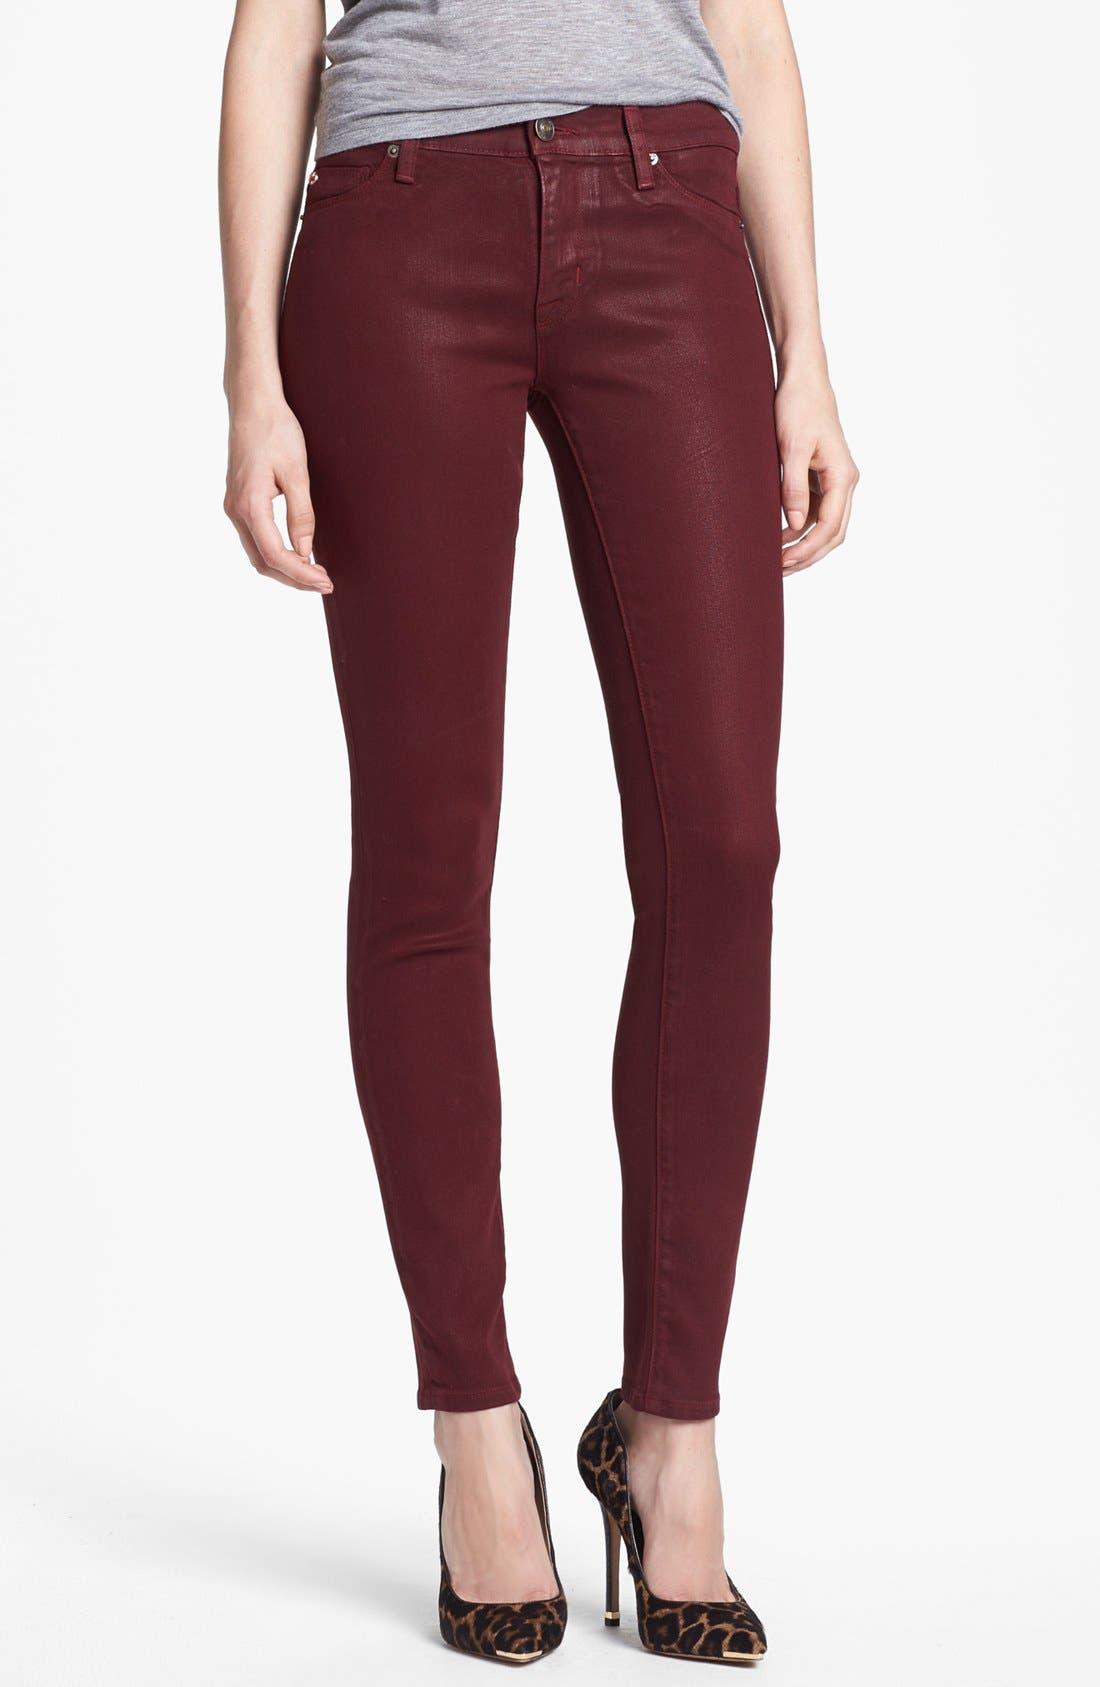 Alternate Image 1 Selected - Hudson Jeans 'Krista' Super Skinny Jeans (Crimson Wax)